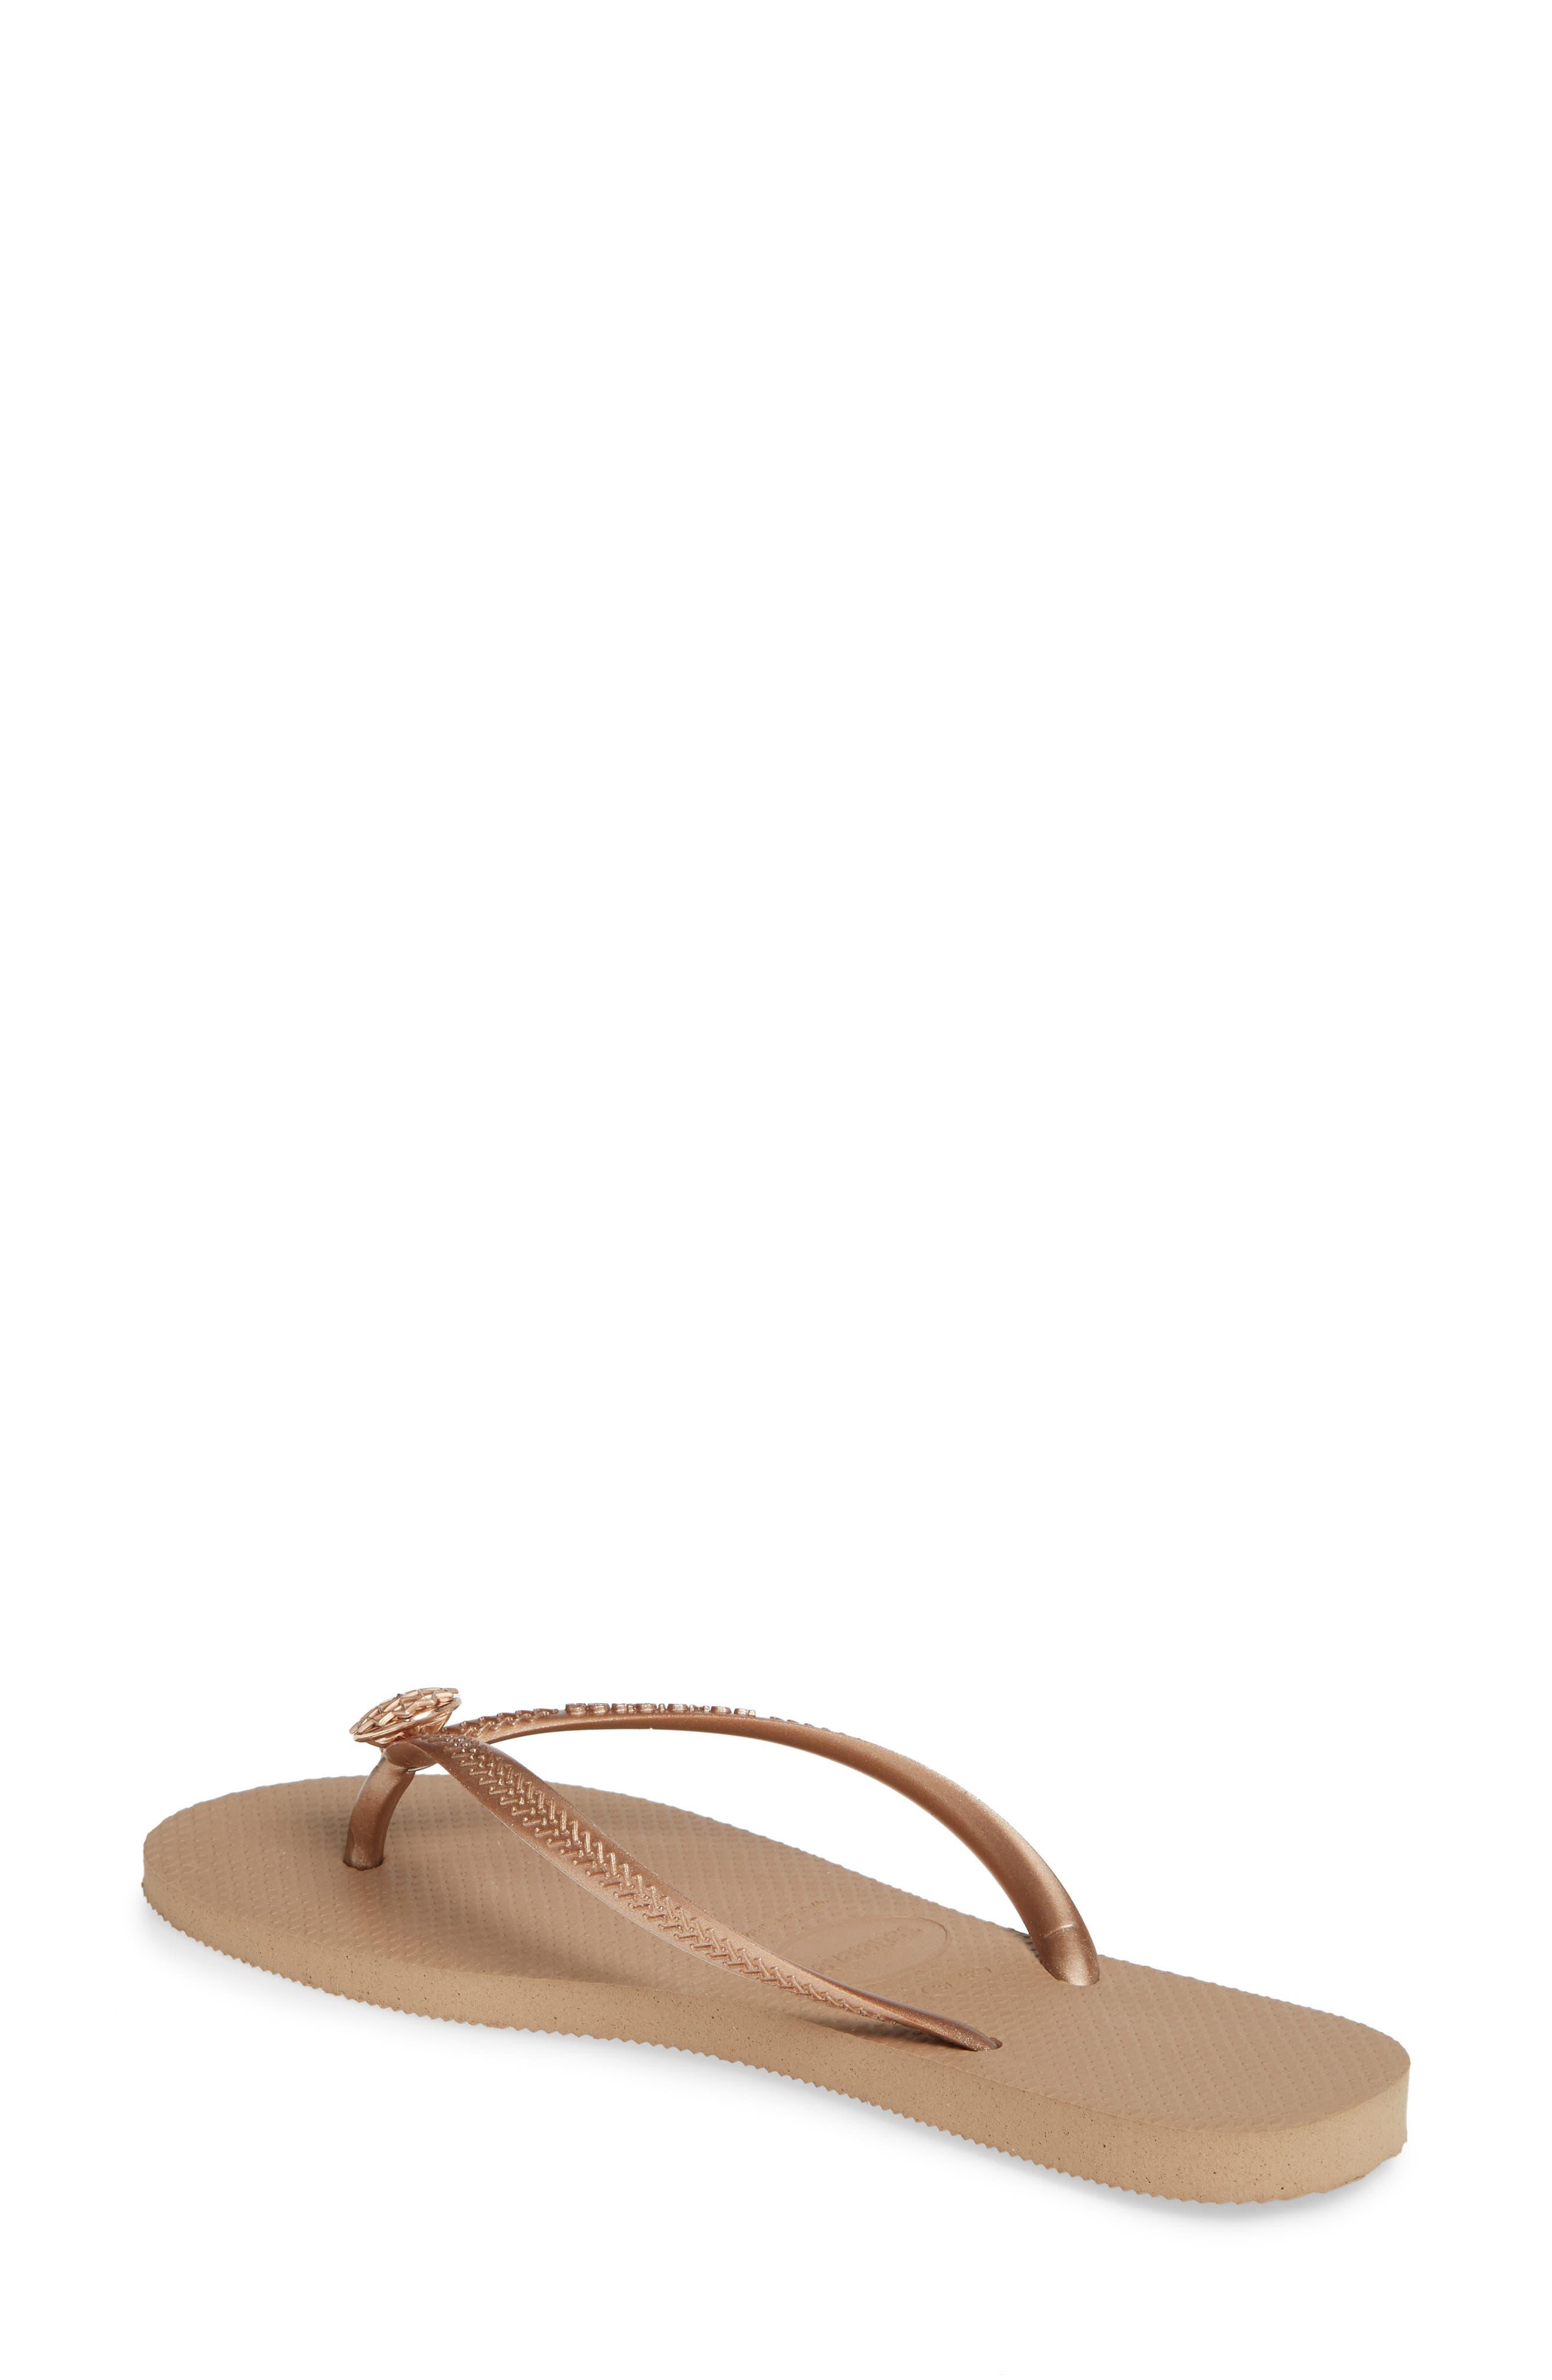 7d420c67fd6f Havaianas Flip-Flops for Women